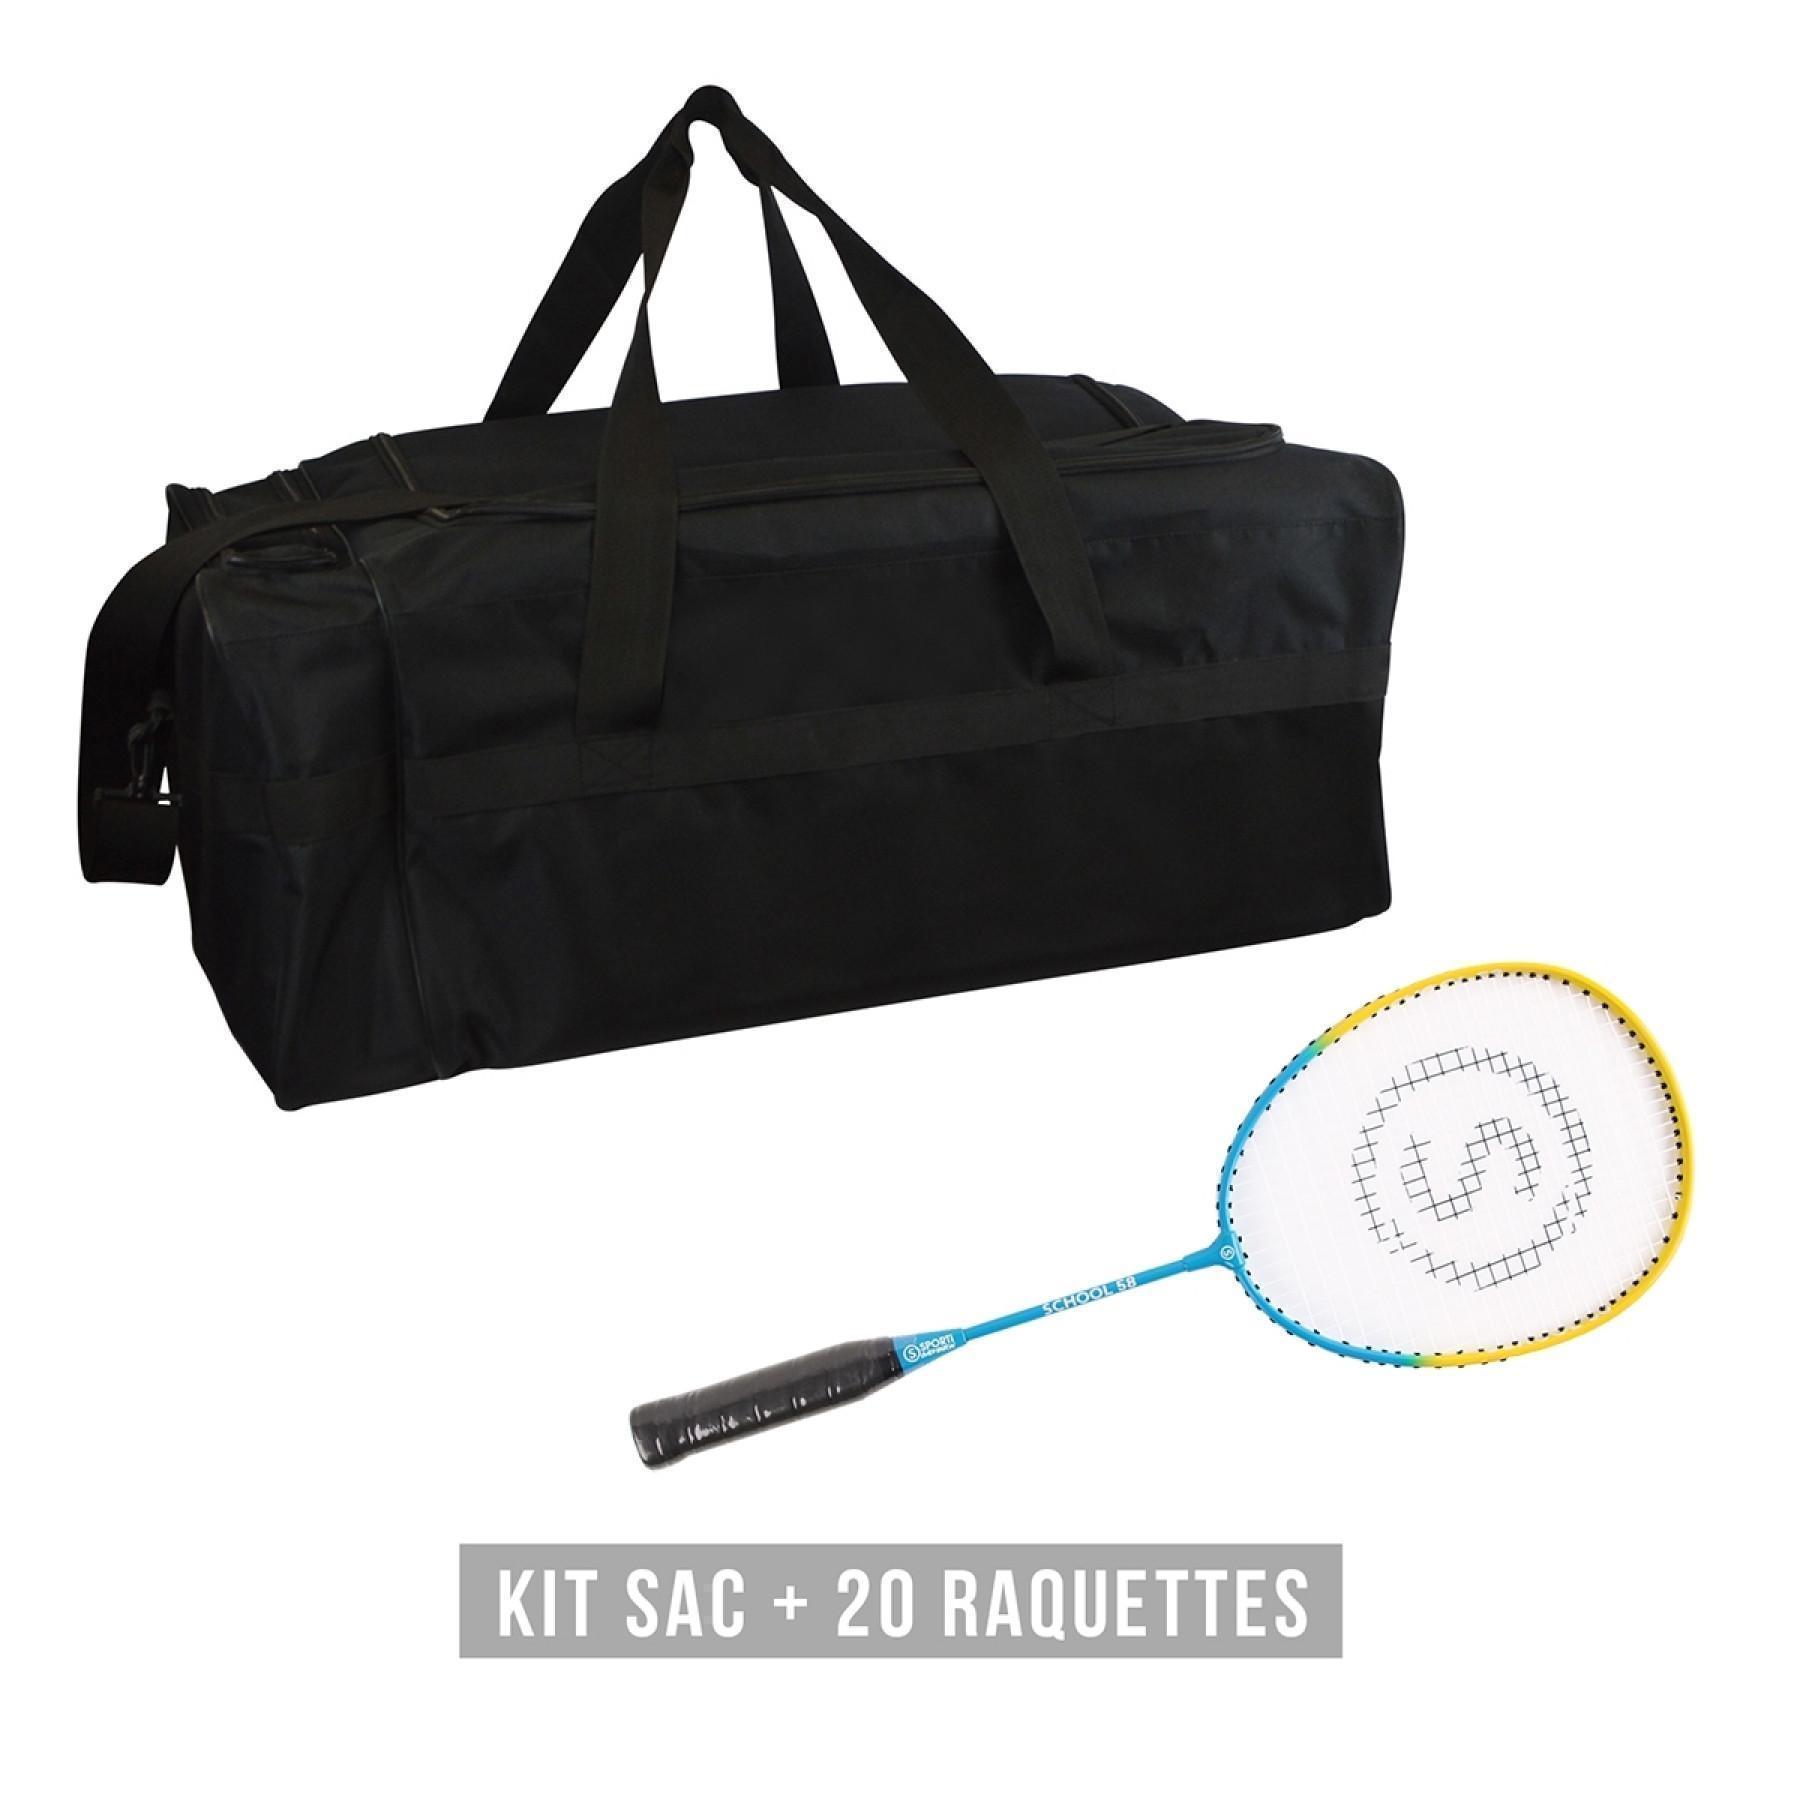 Kit snowshoes (bag + 20 snowshoes) child Sporti France School 58